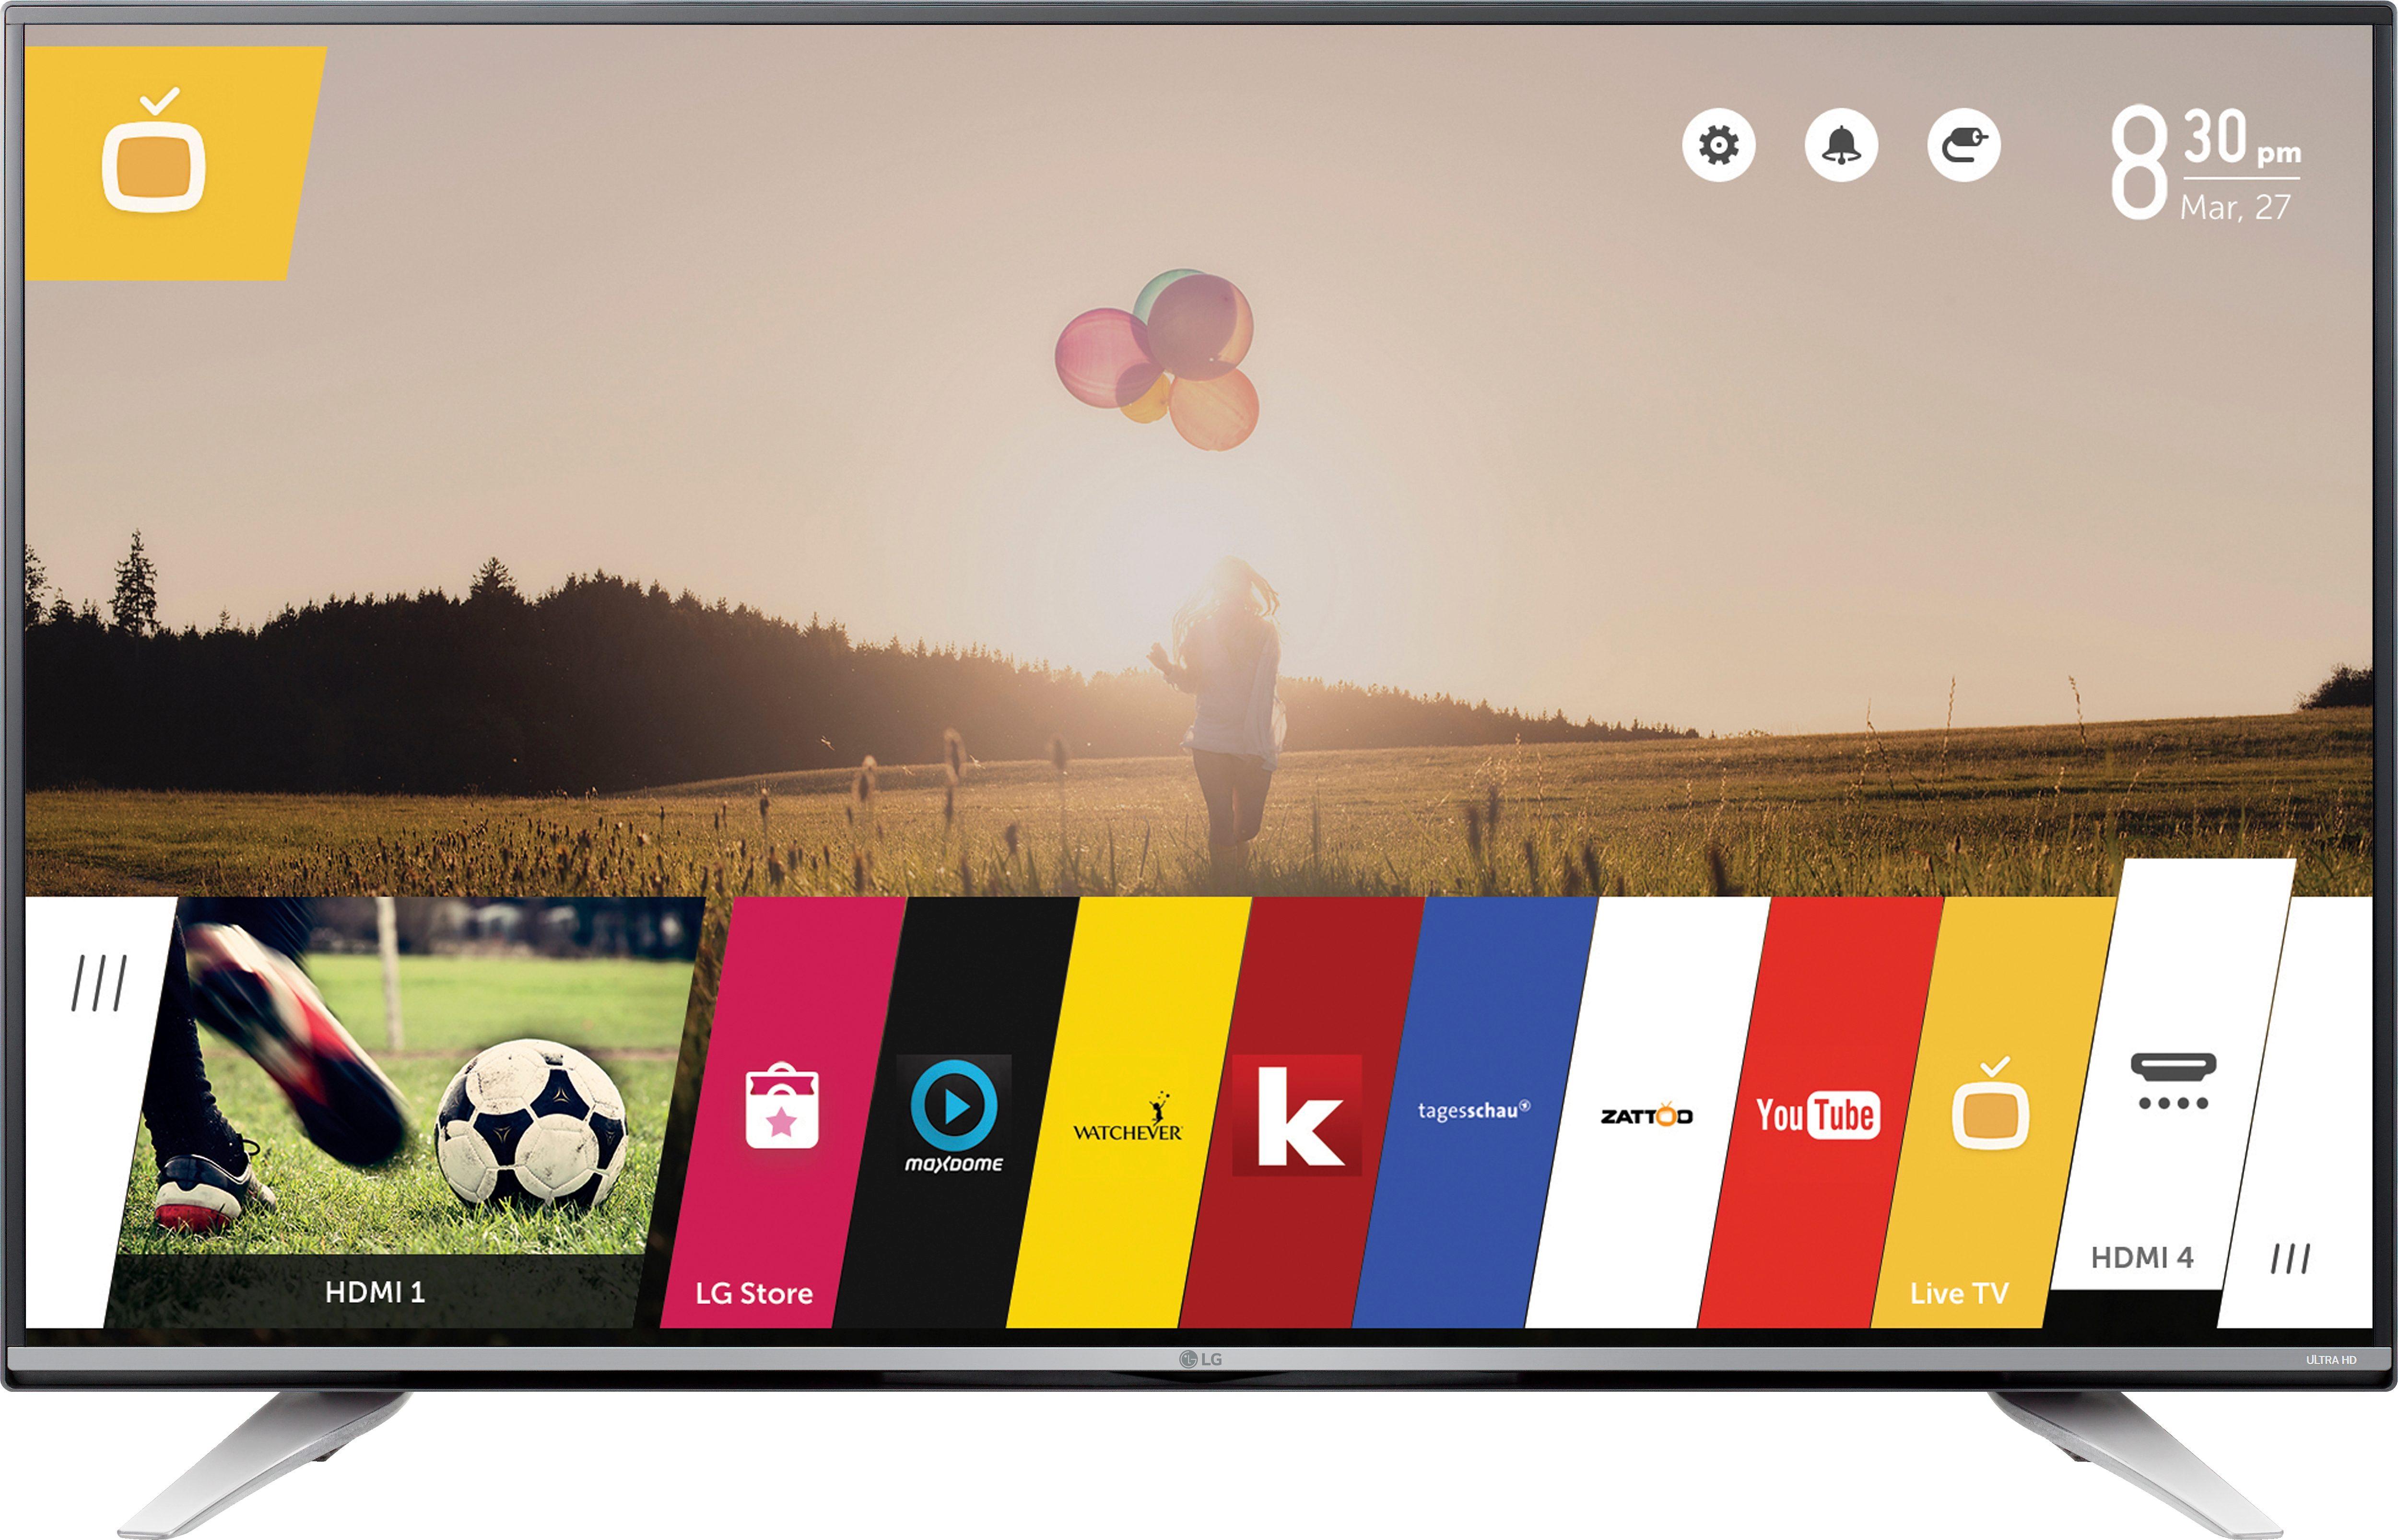 LG 55UF7729, 139 cm (55 Zoll), 2160p (4K Ultra HD) LED Fernseher